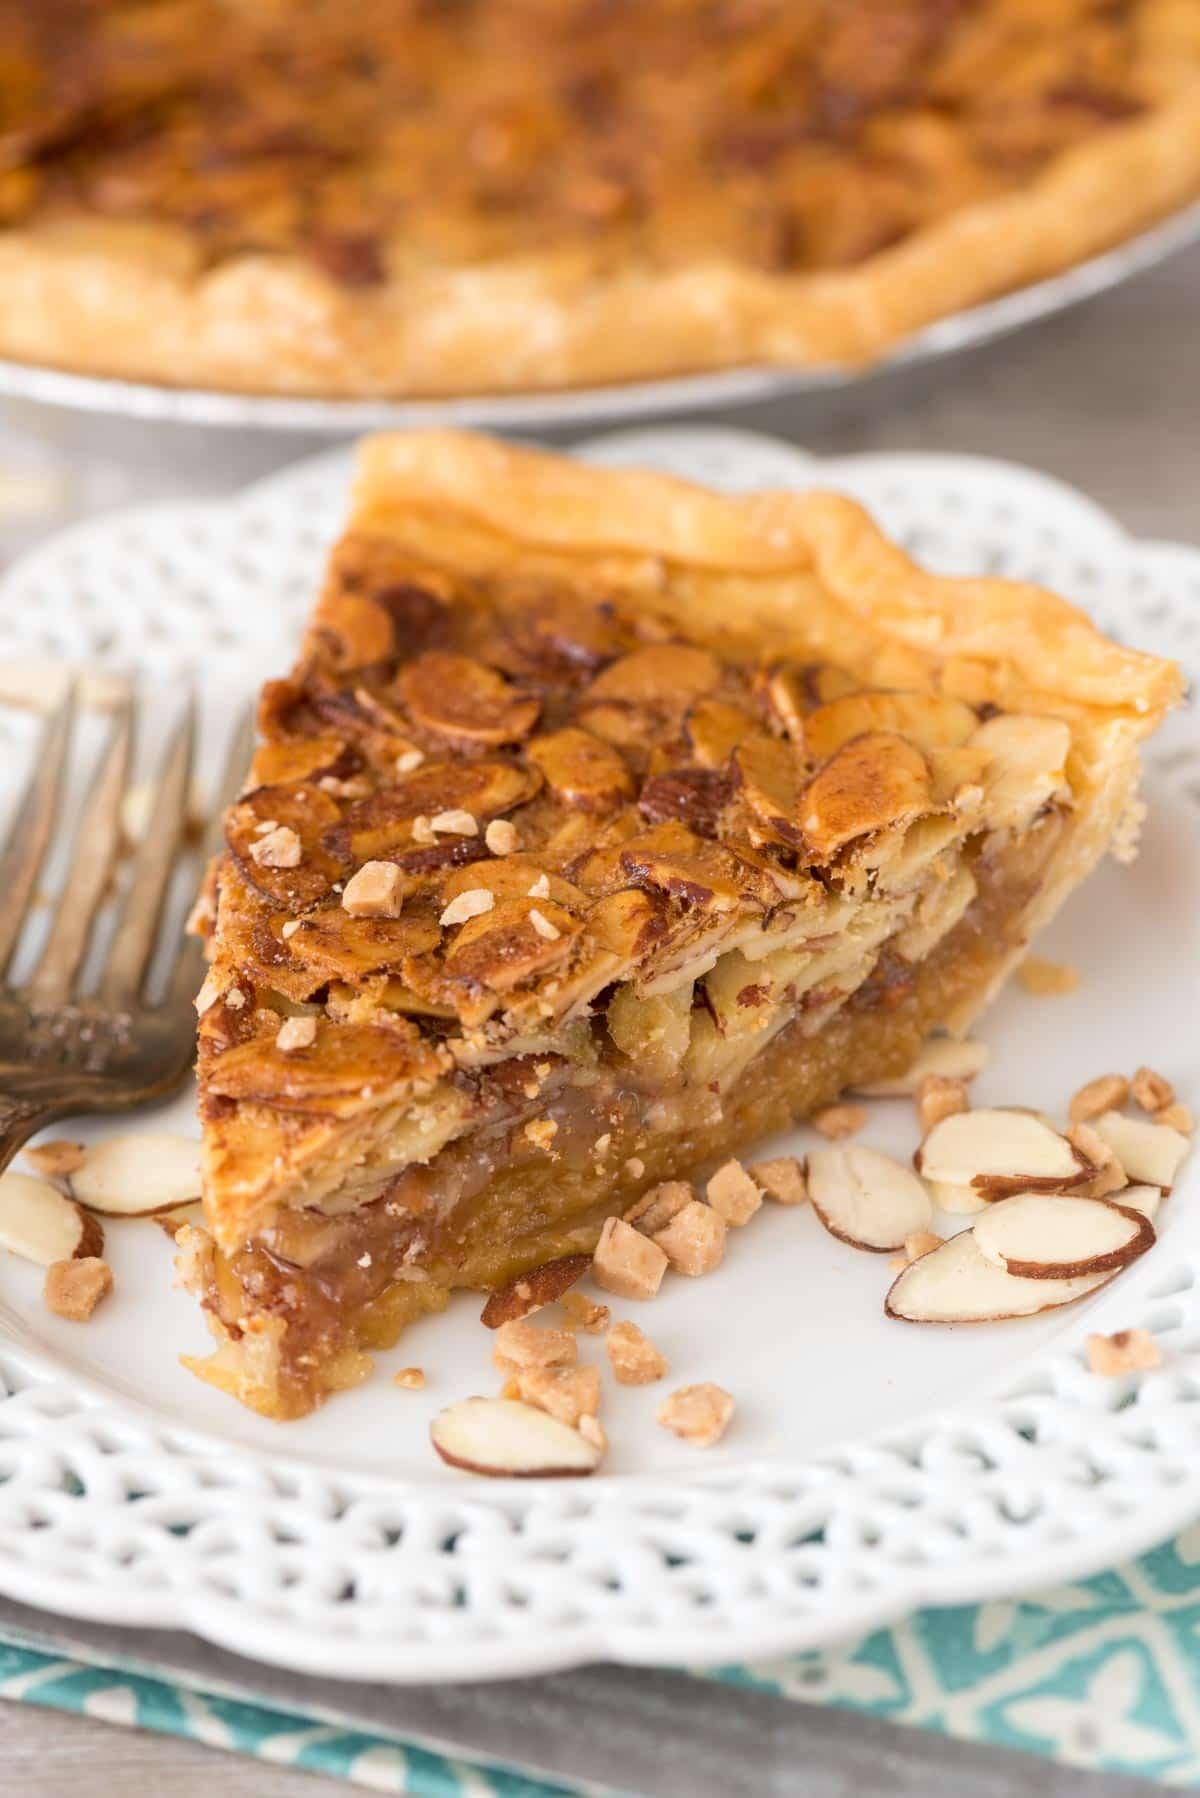 Toffee Almond Pie